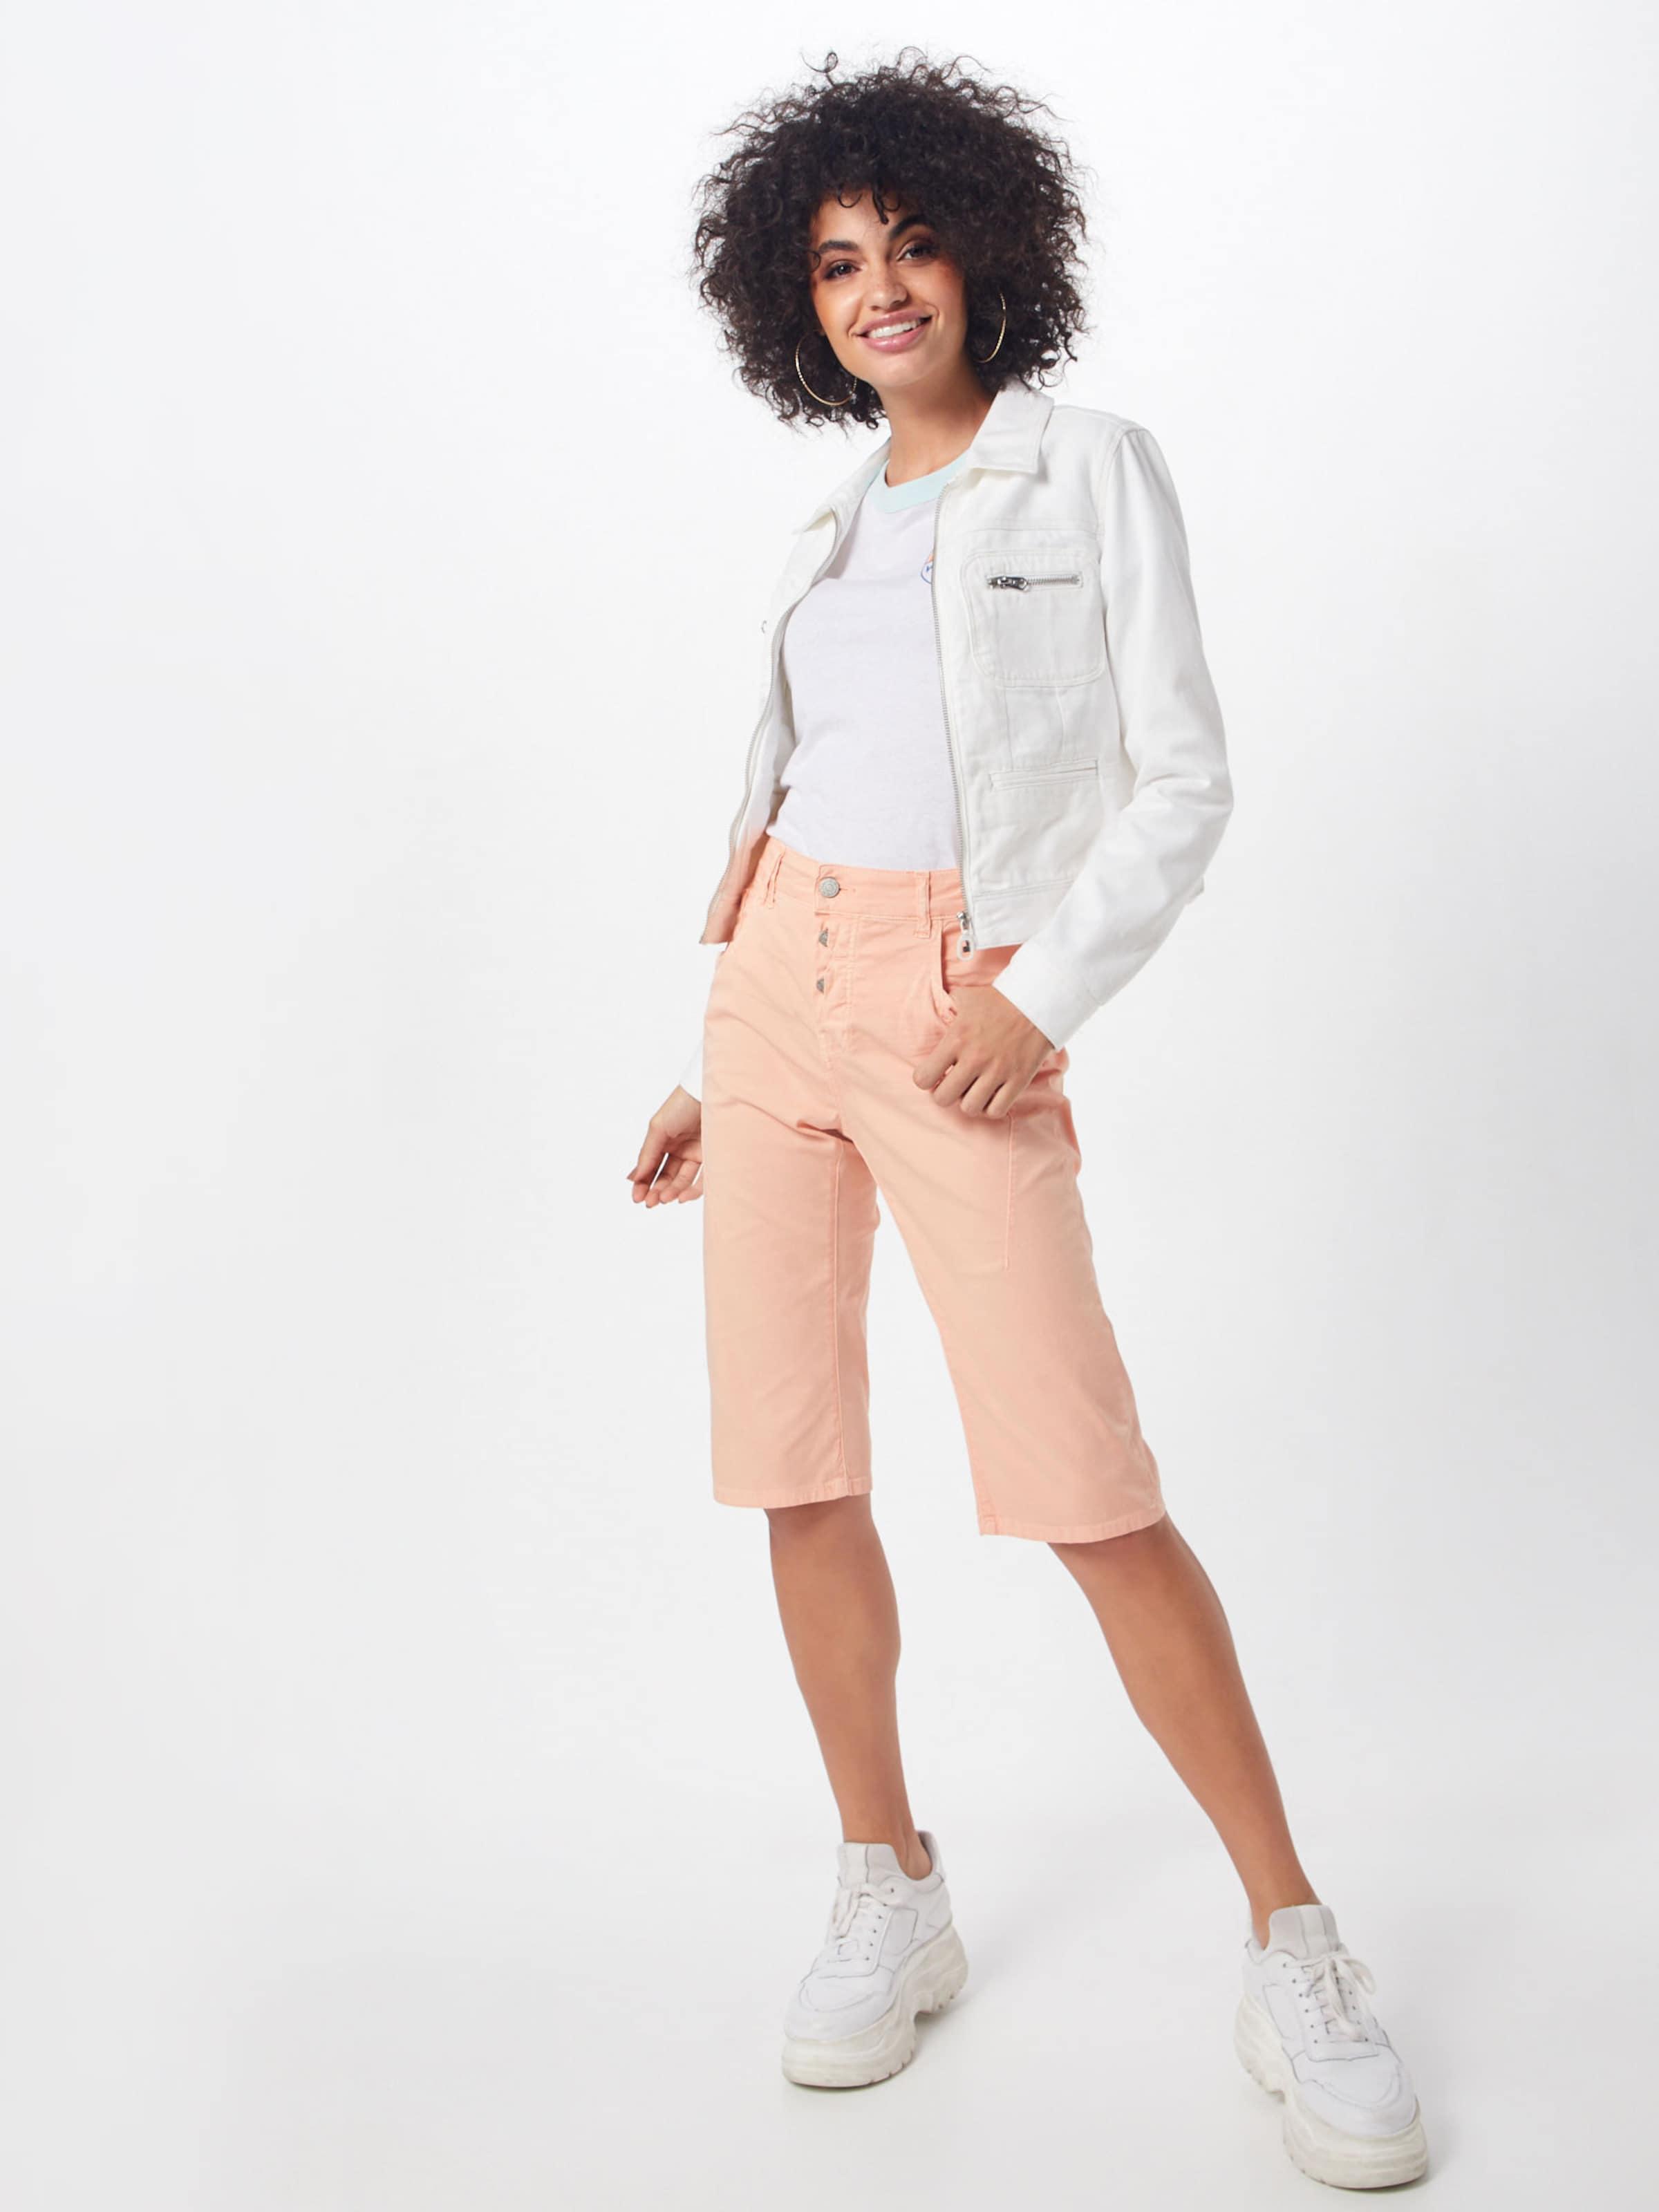 Georgina' 'new Pfirsich Jeans Gang In tQxsdhrC